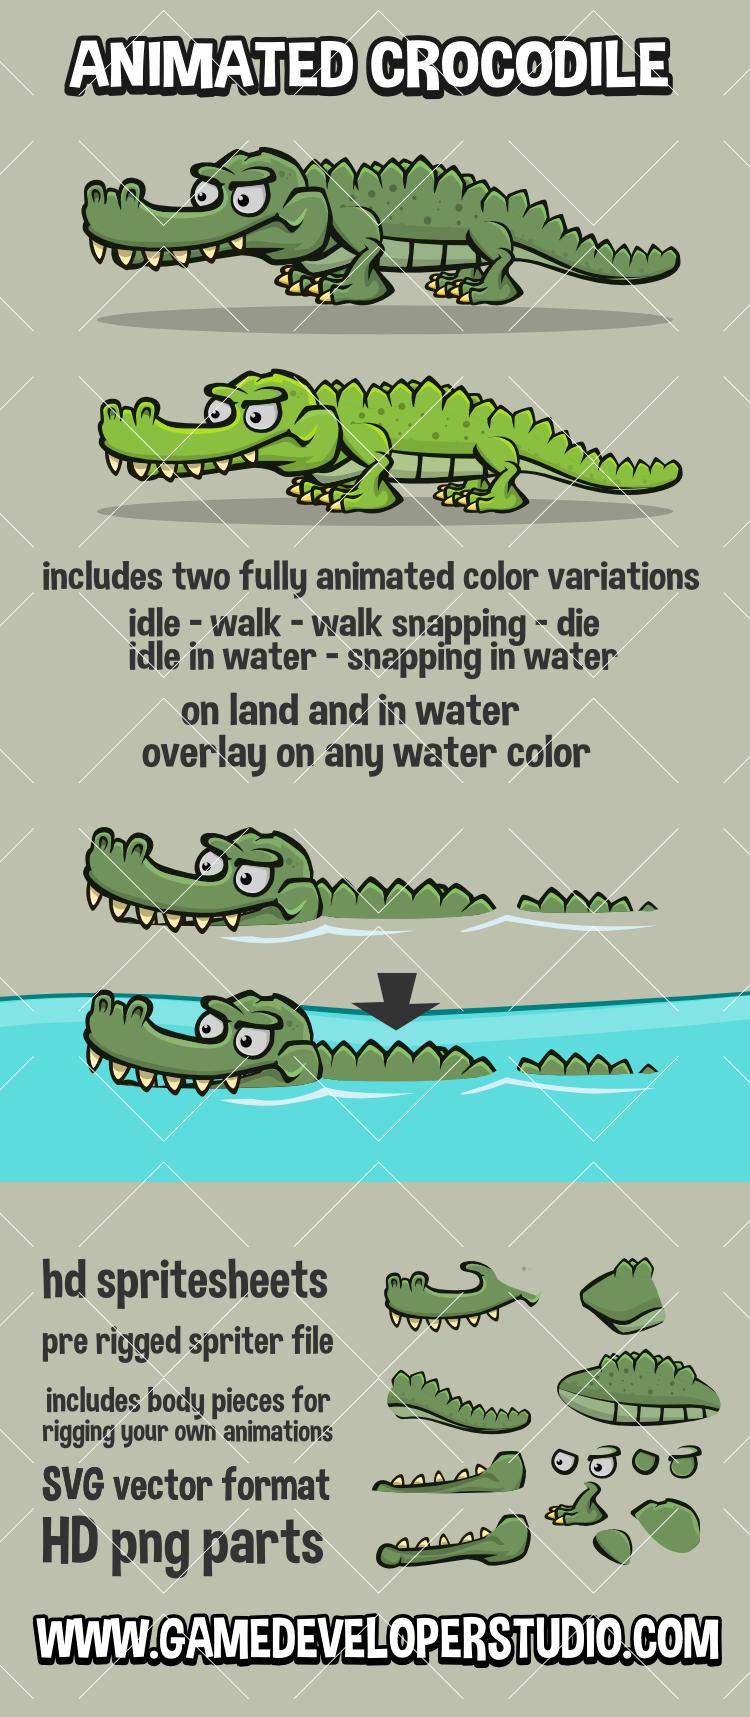 Animated crocodile game asset